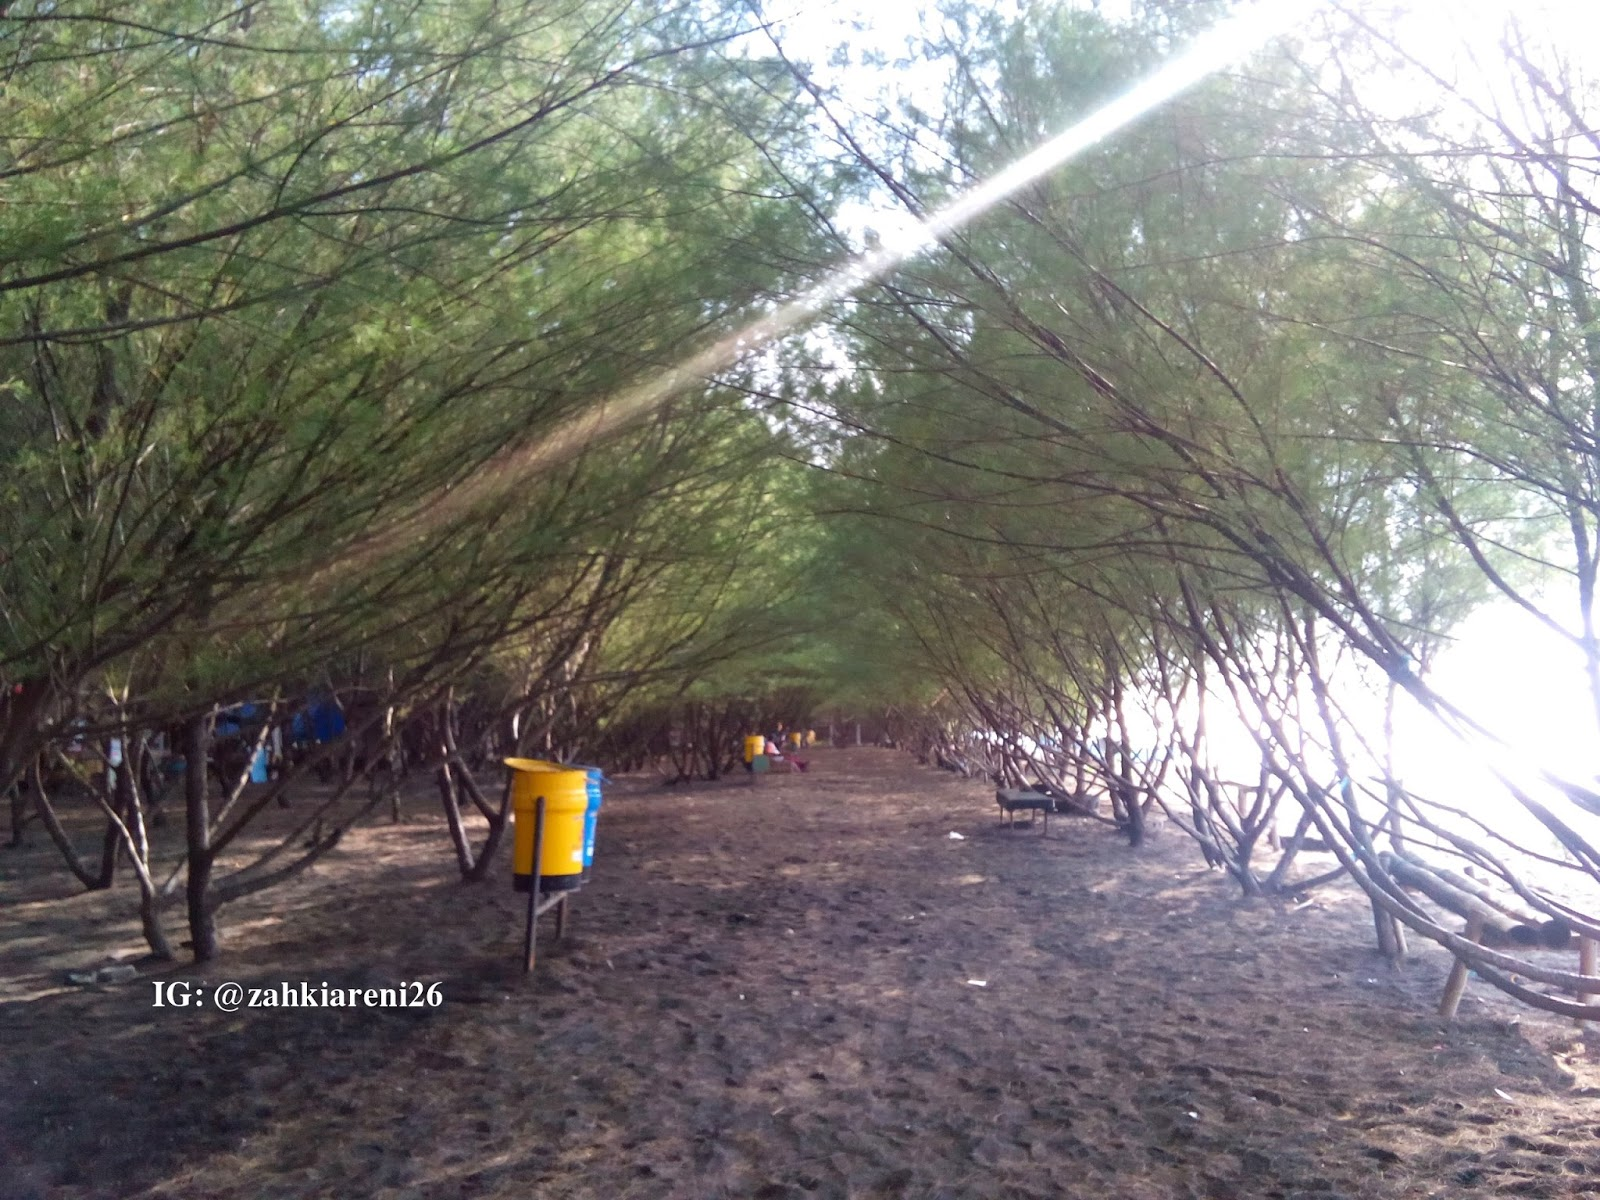 Wajah Pantai Cemara Banyuwangi Hutan Follow Instagram Zahkiareni26 Kab